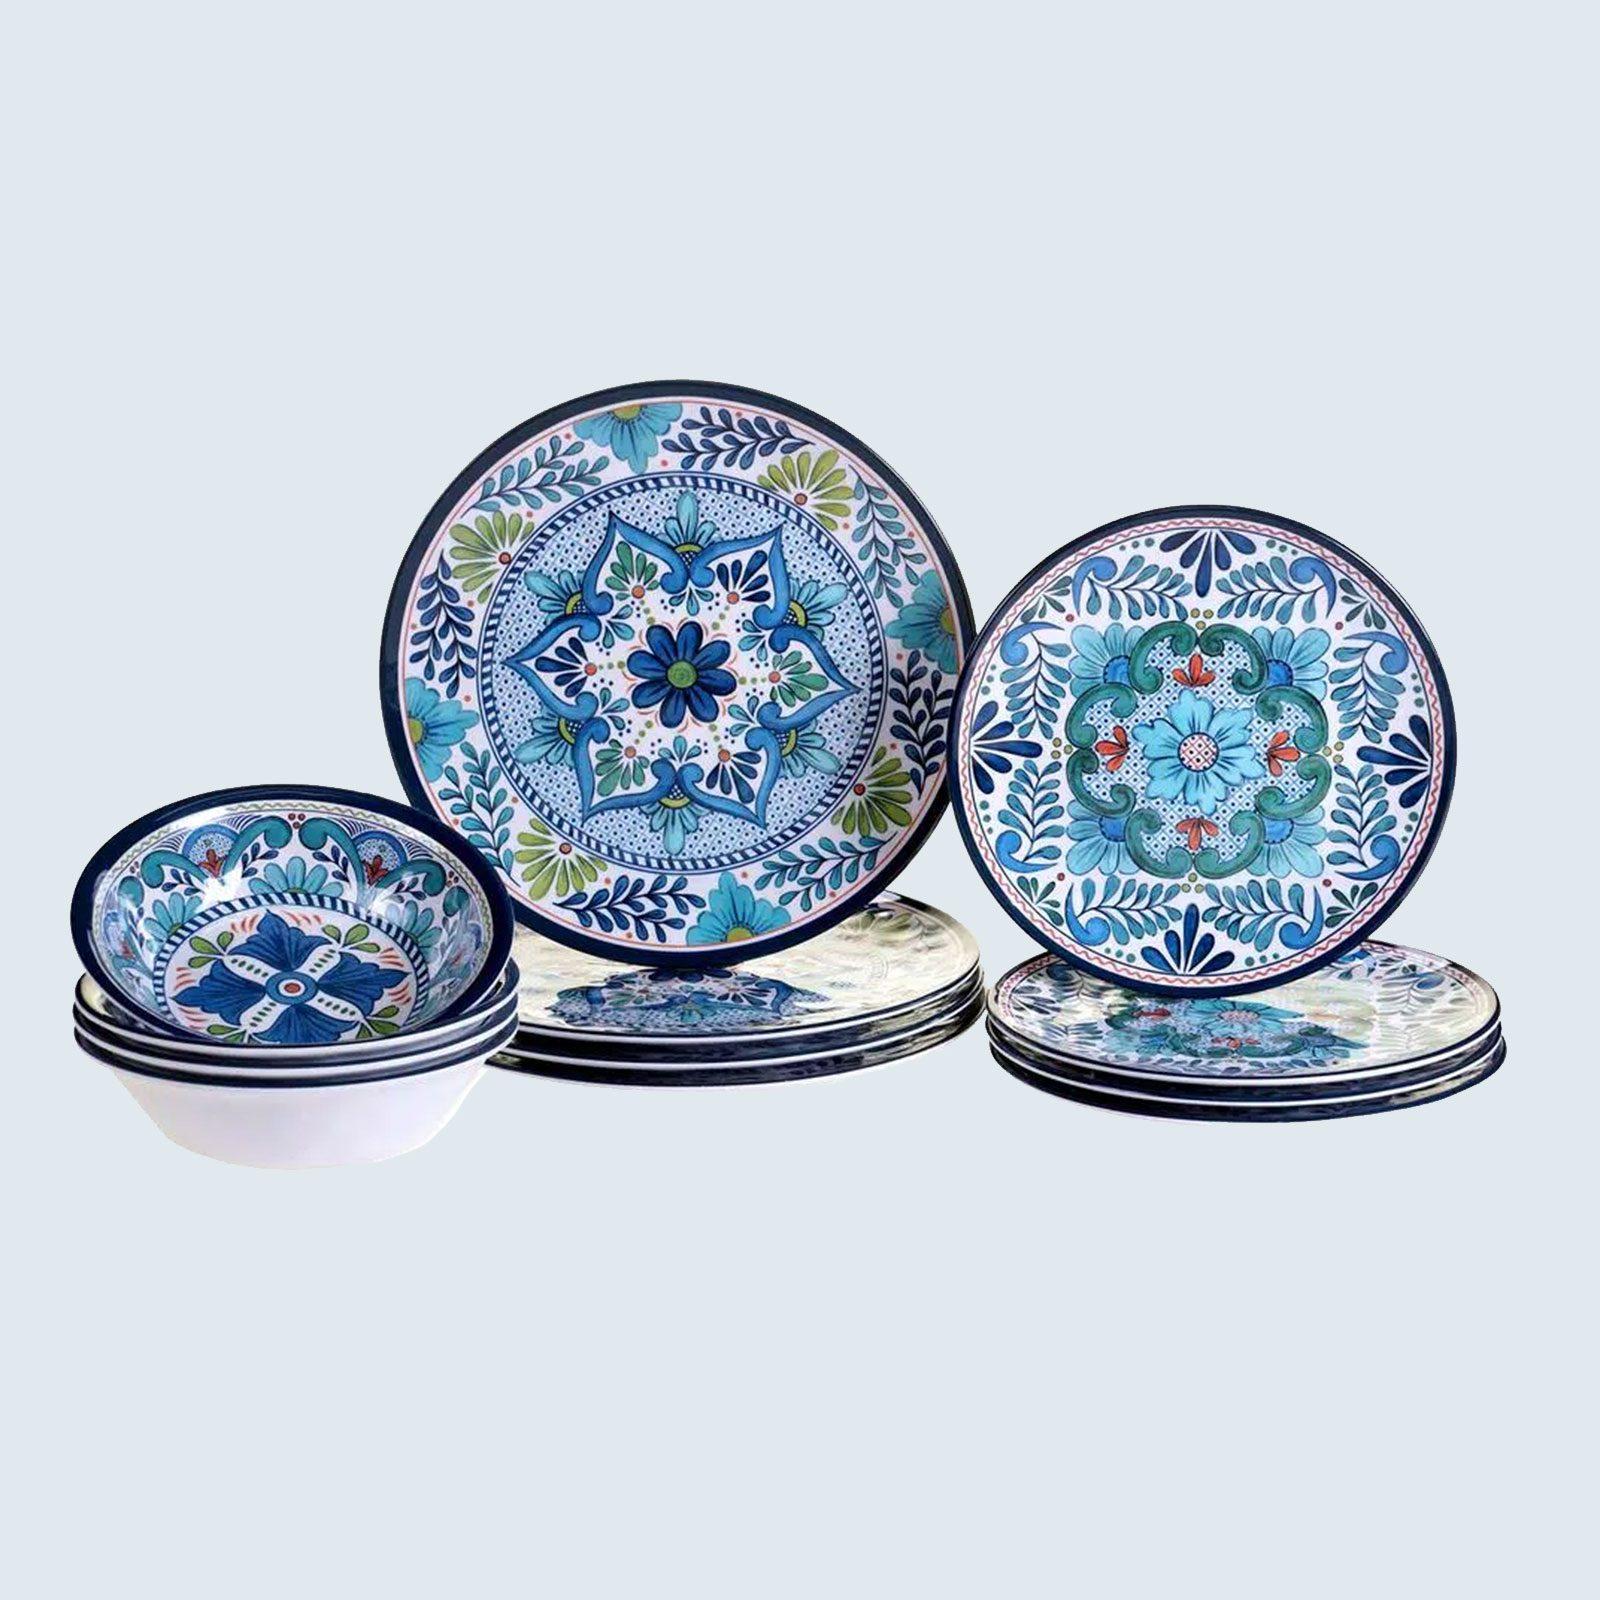 Talavera 12-Piece Melamine Dinnerware Set